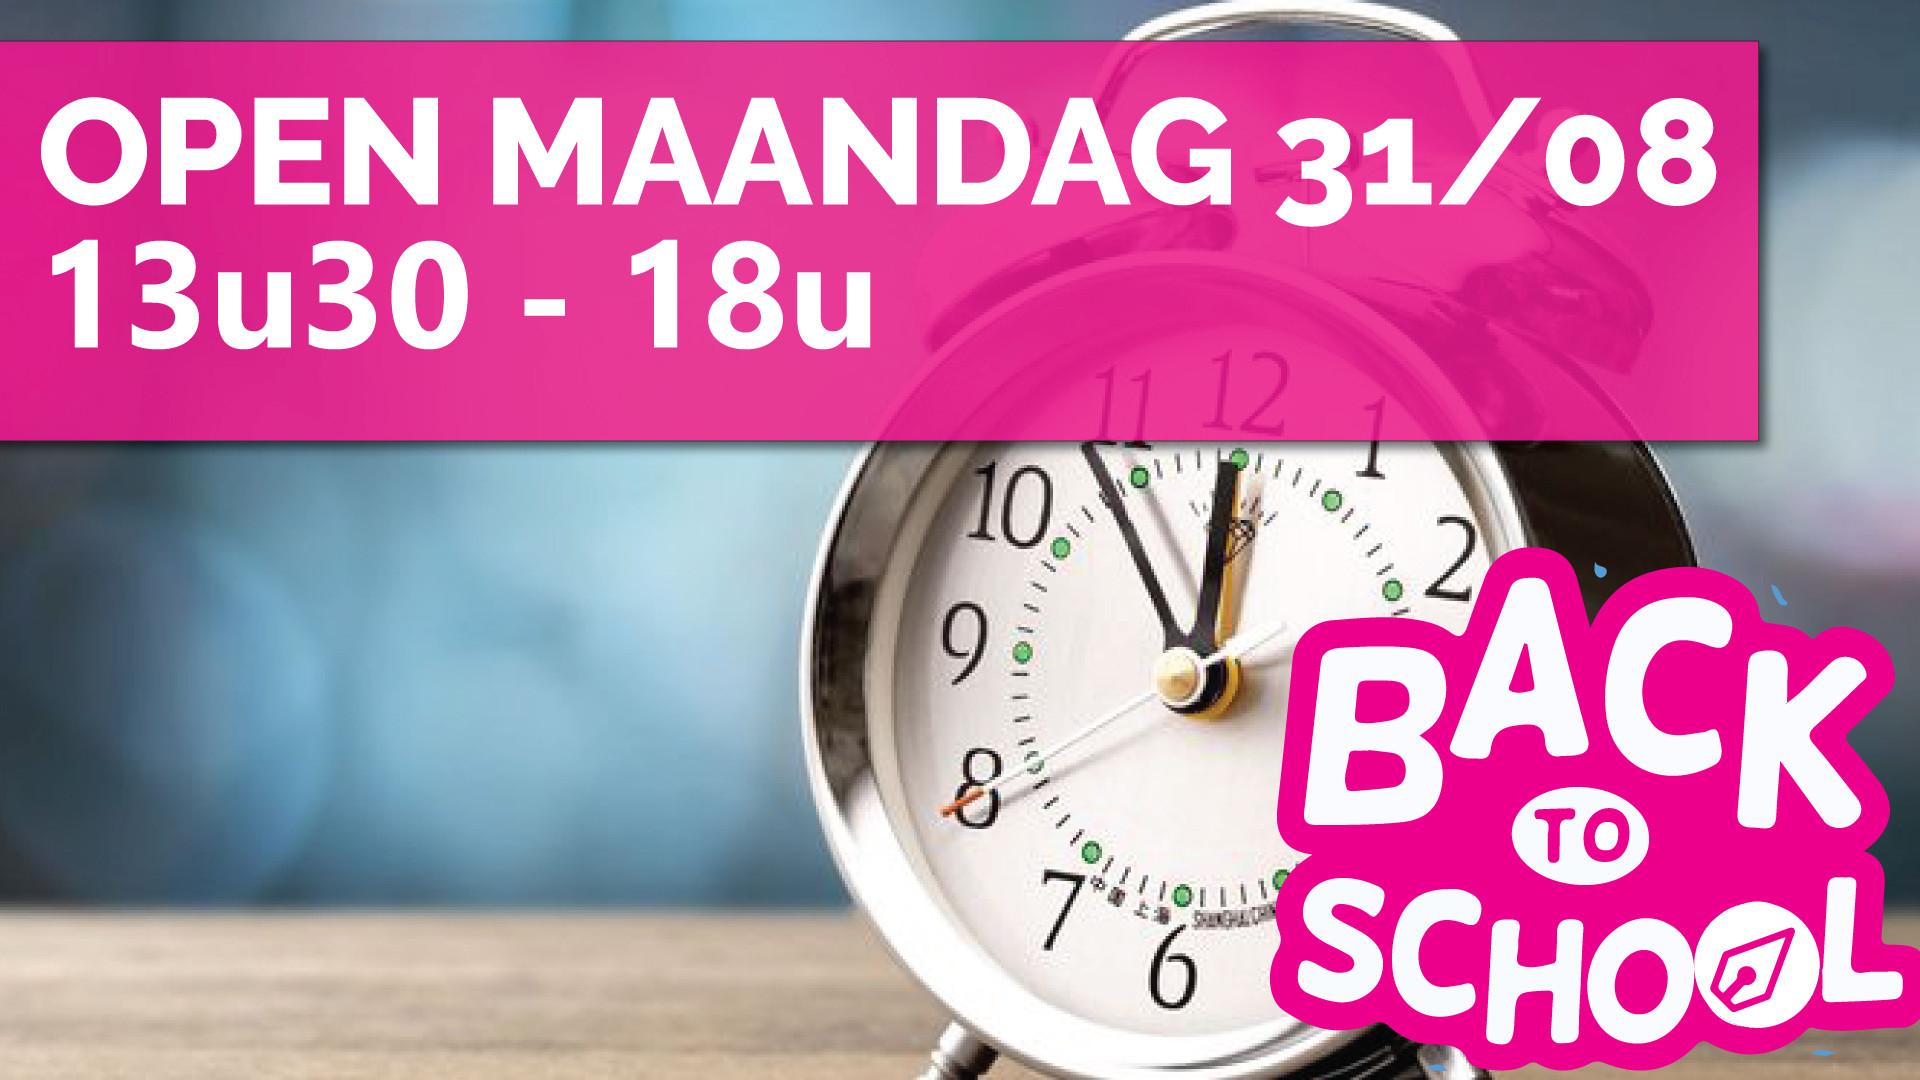 back to school promo actie open maandag 31 augustus marcelis Halle ctouch clevertouch